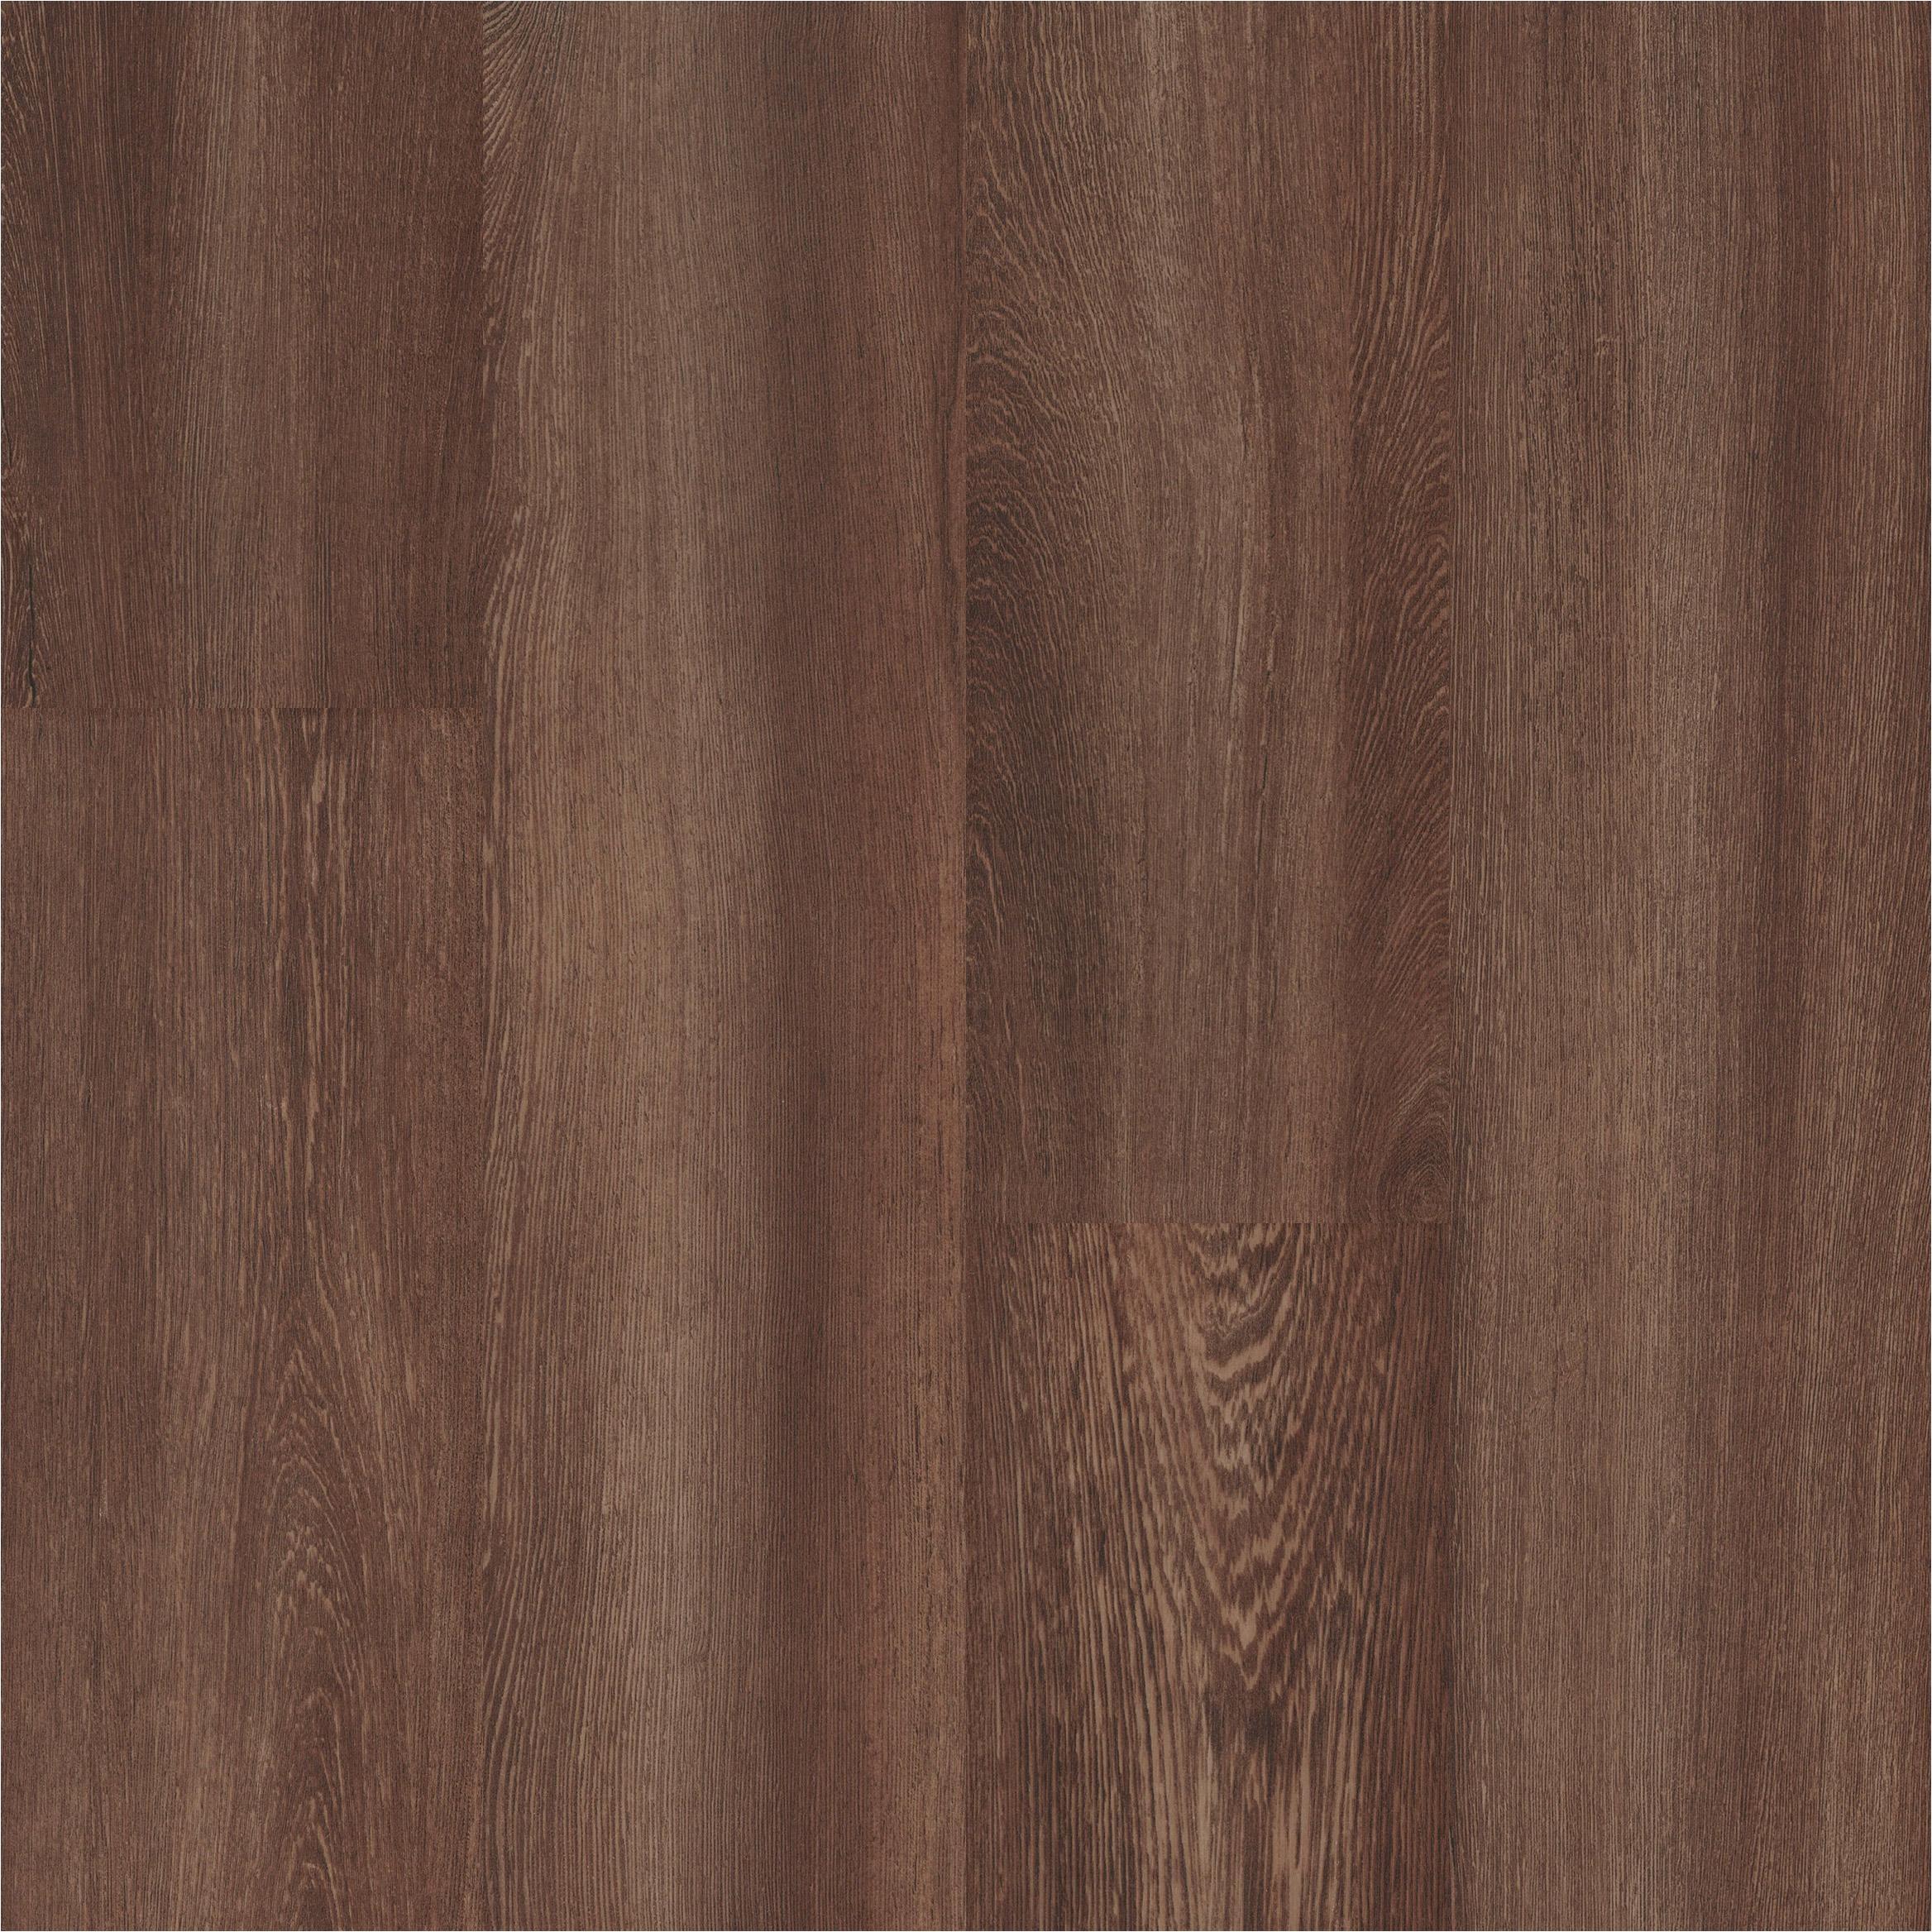 Is All Vinyl Plank Flooring Waterproof Ivc Moduleo Horizon normandy Oak 6 Waterproof Luxury Vinyl Plank